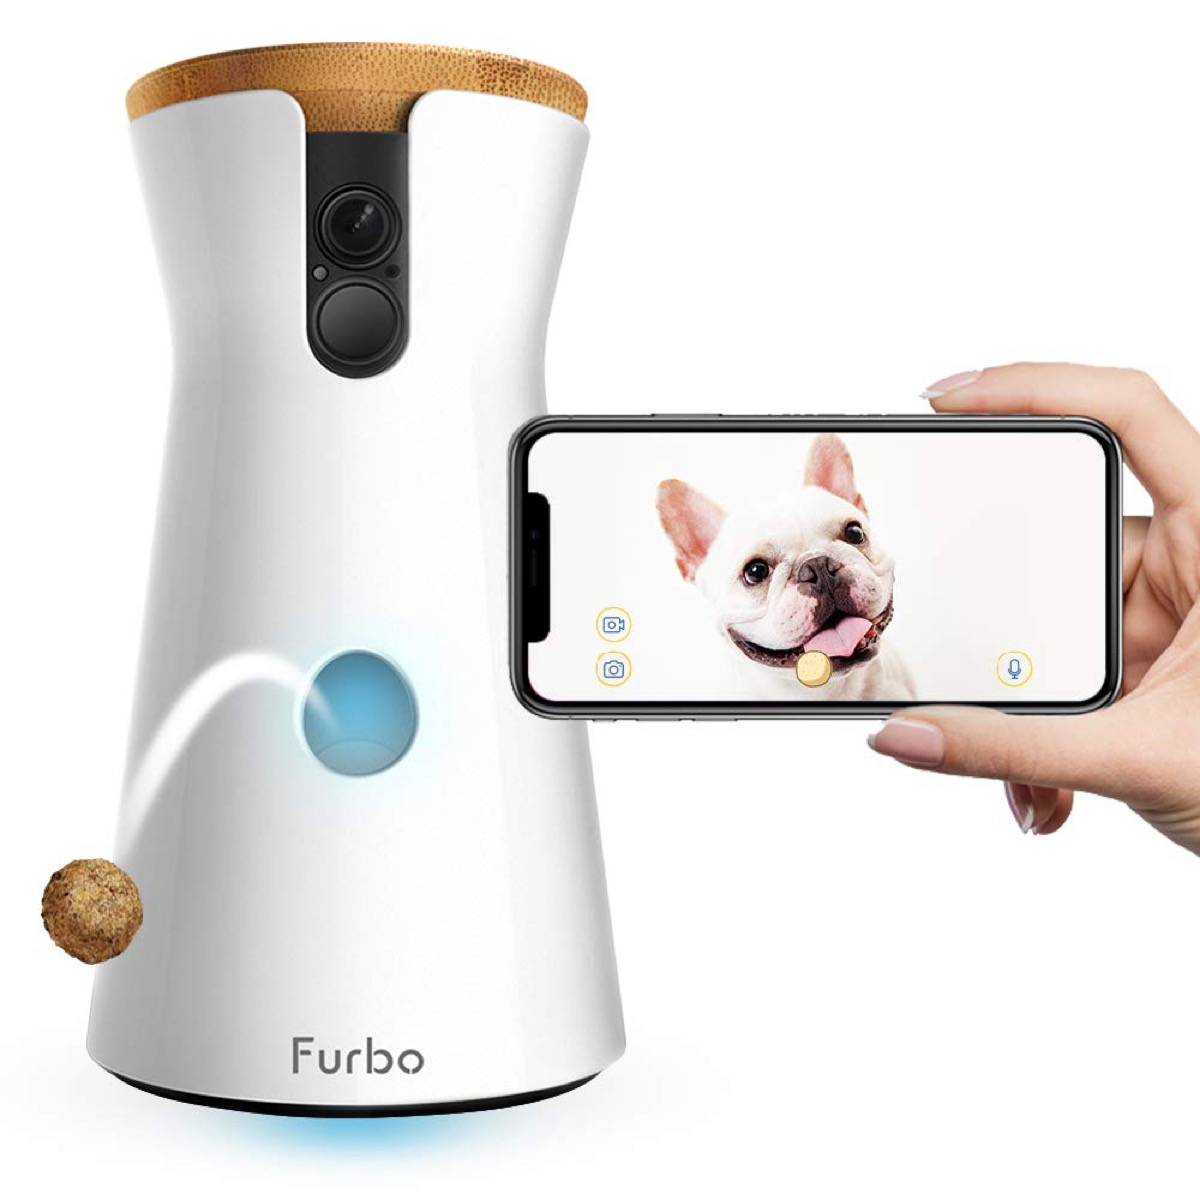 furbo dog camera and white hand holding iphone